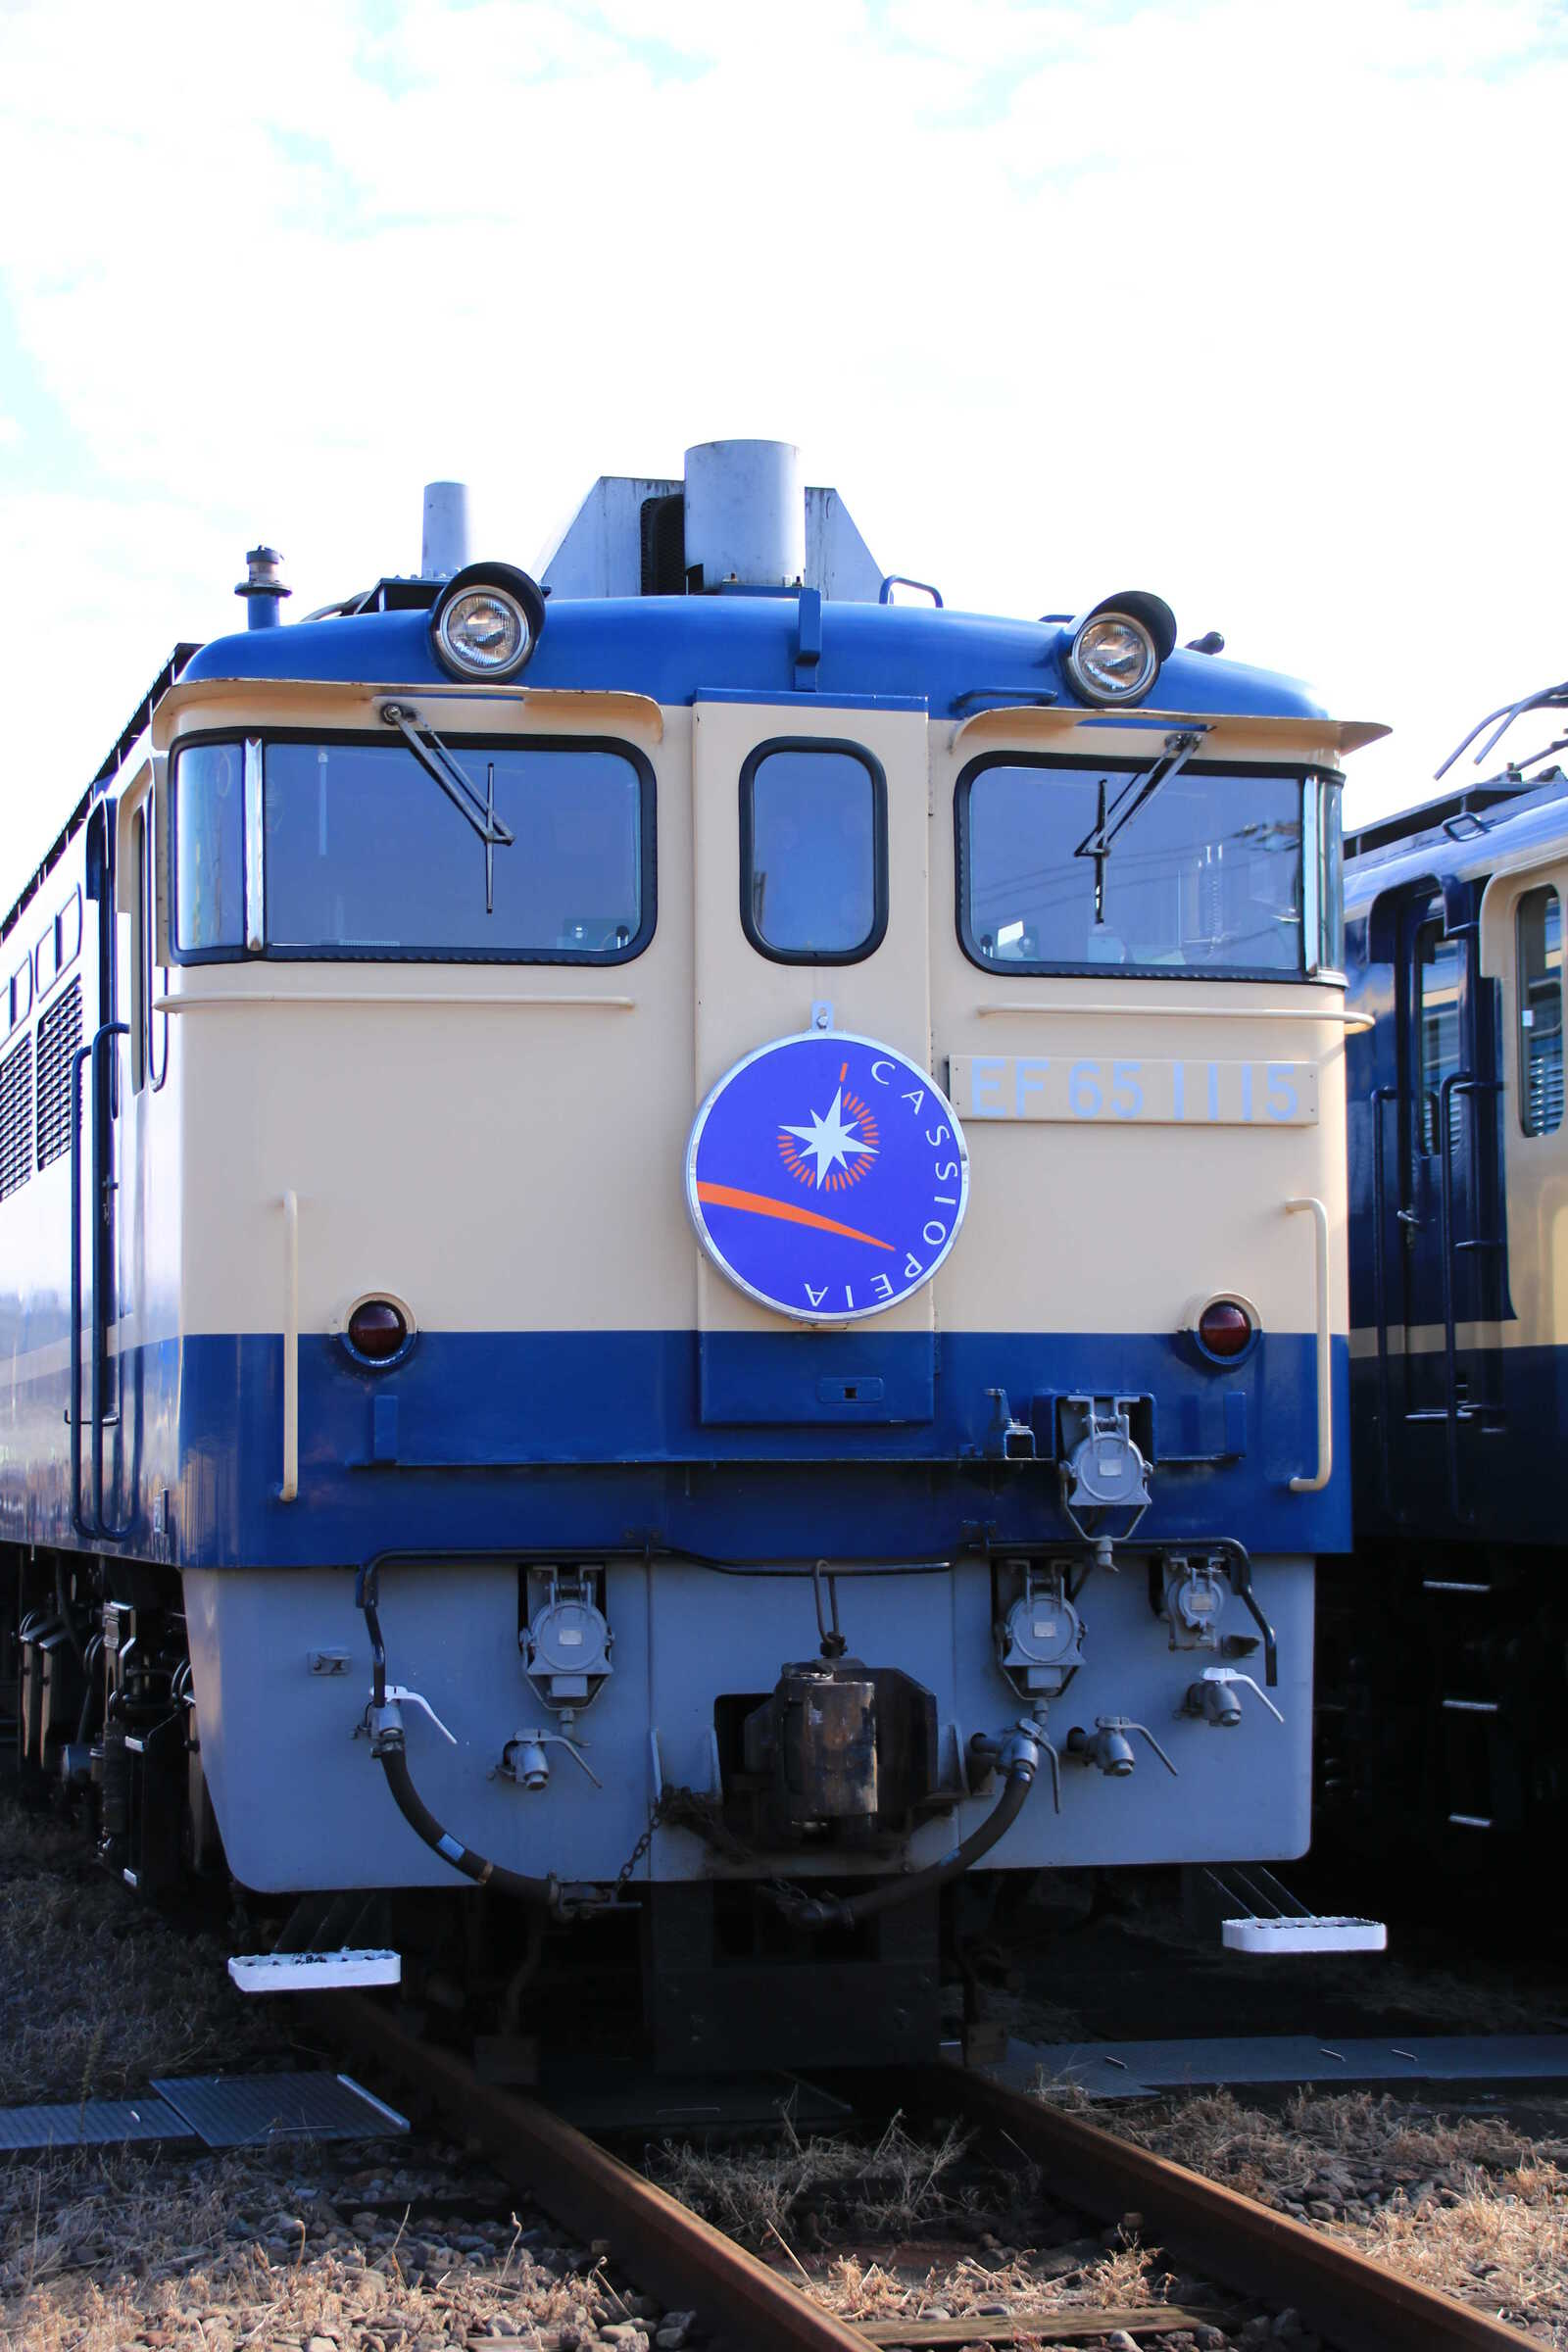 EF65-1115①[田] カシオペアヘッドマーク